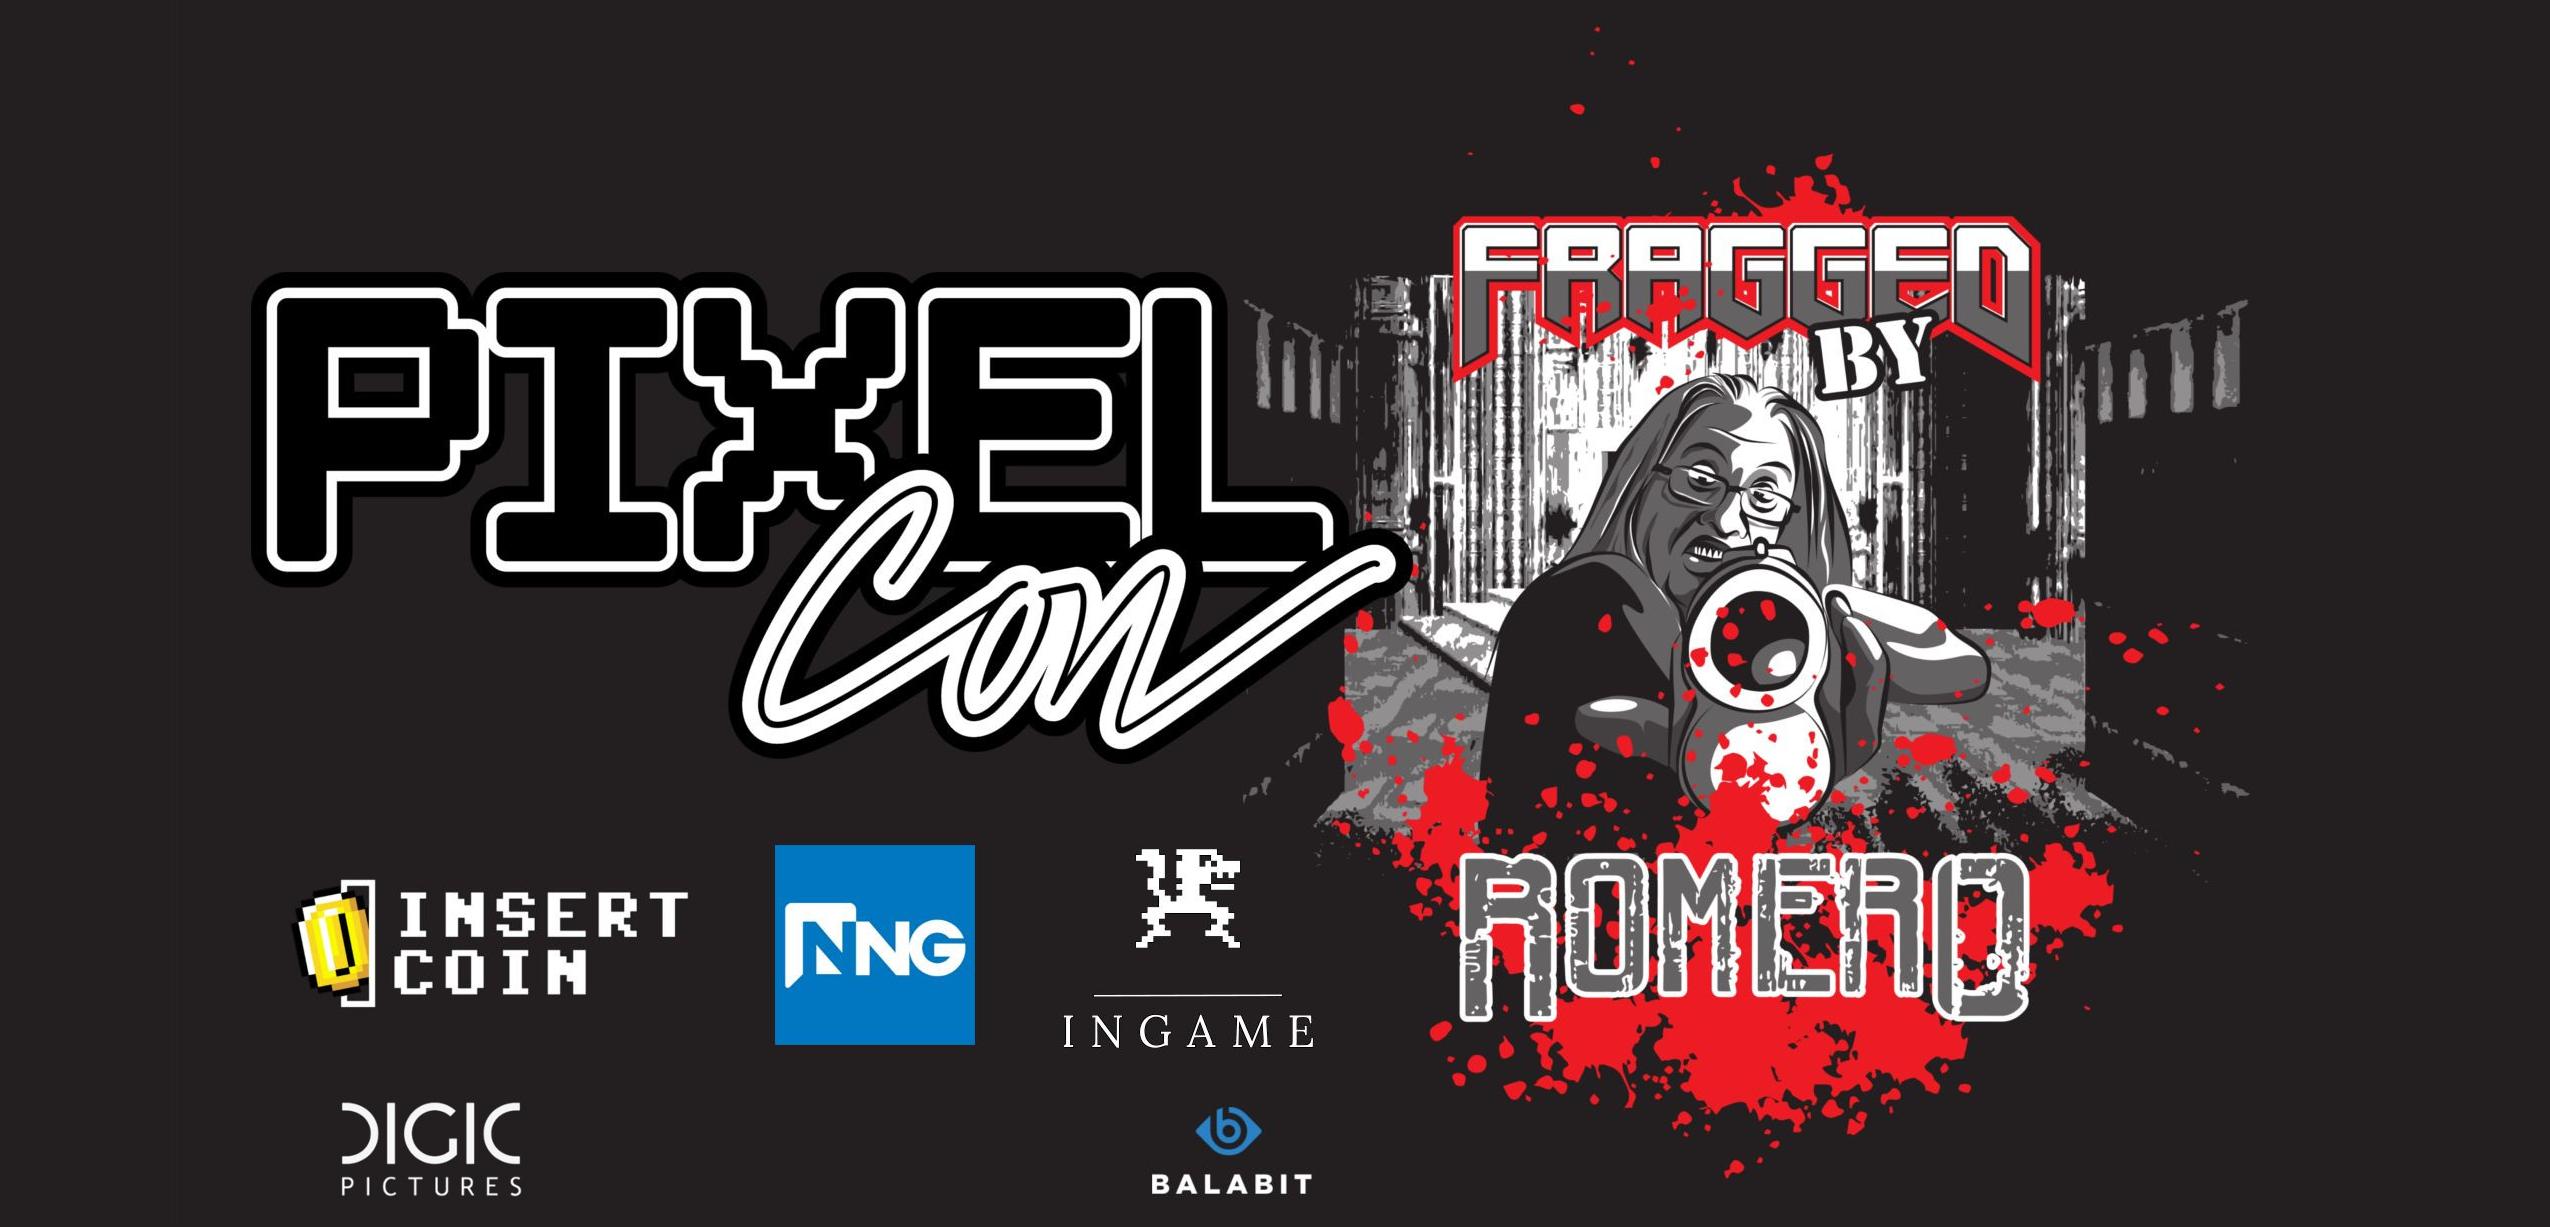 PixelCon 2017 – Fragged By Romero (HUN)